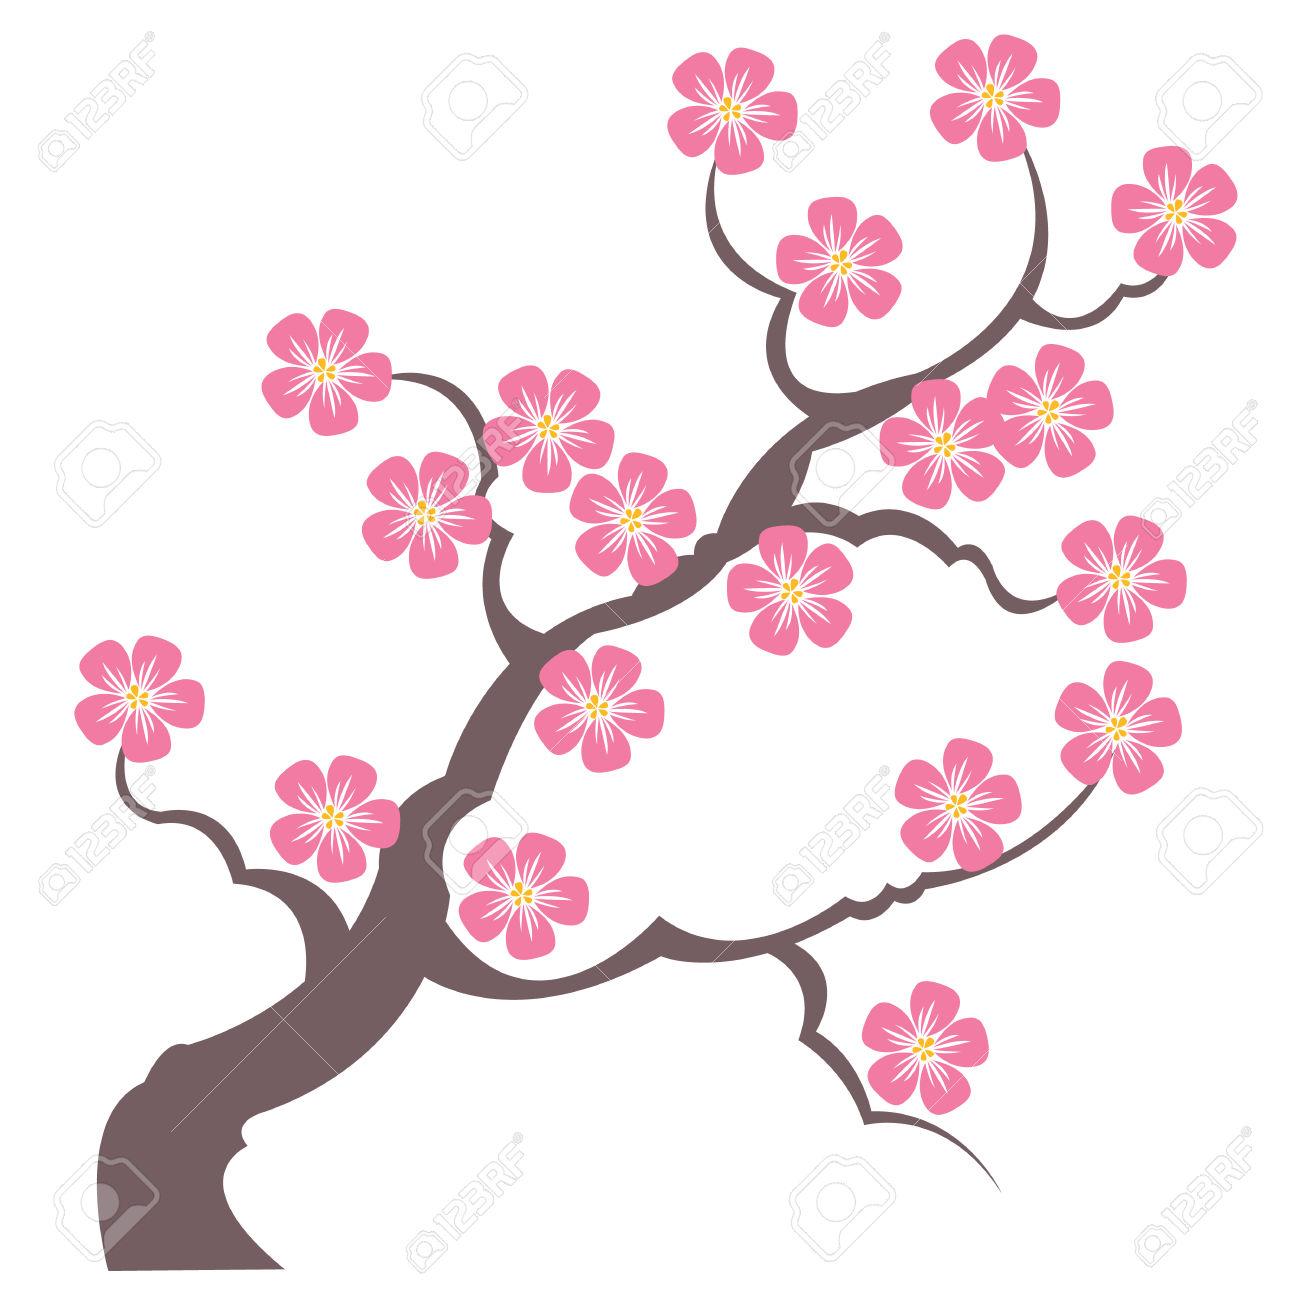 1300x1300 Drawn Sakura Blossom Silhouette